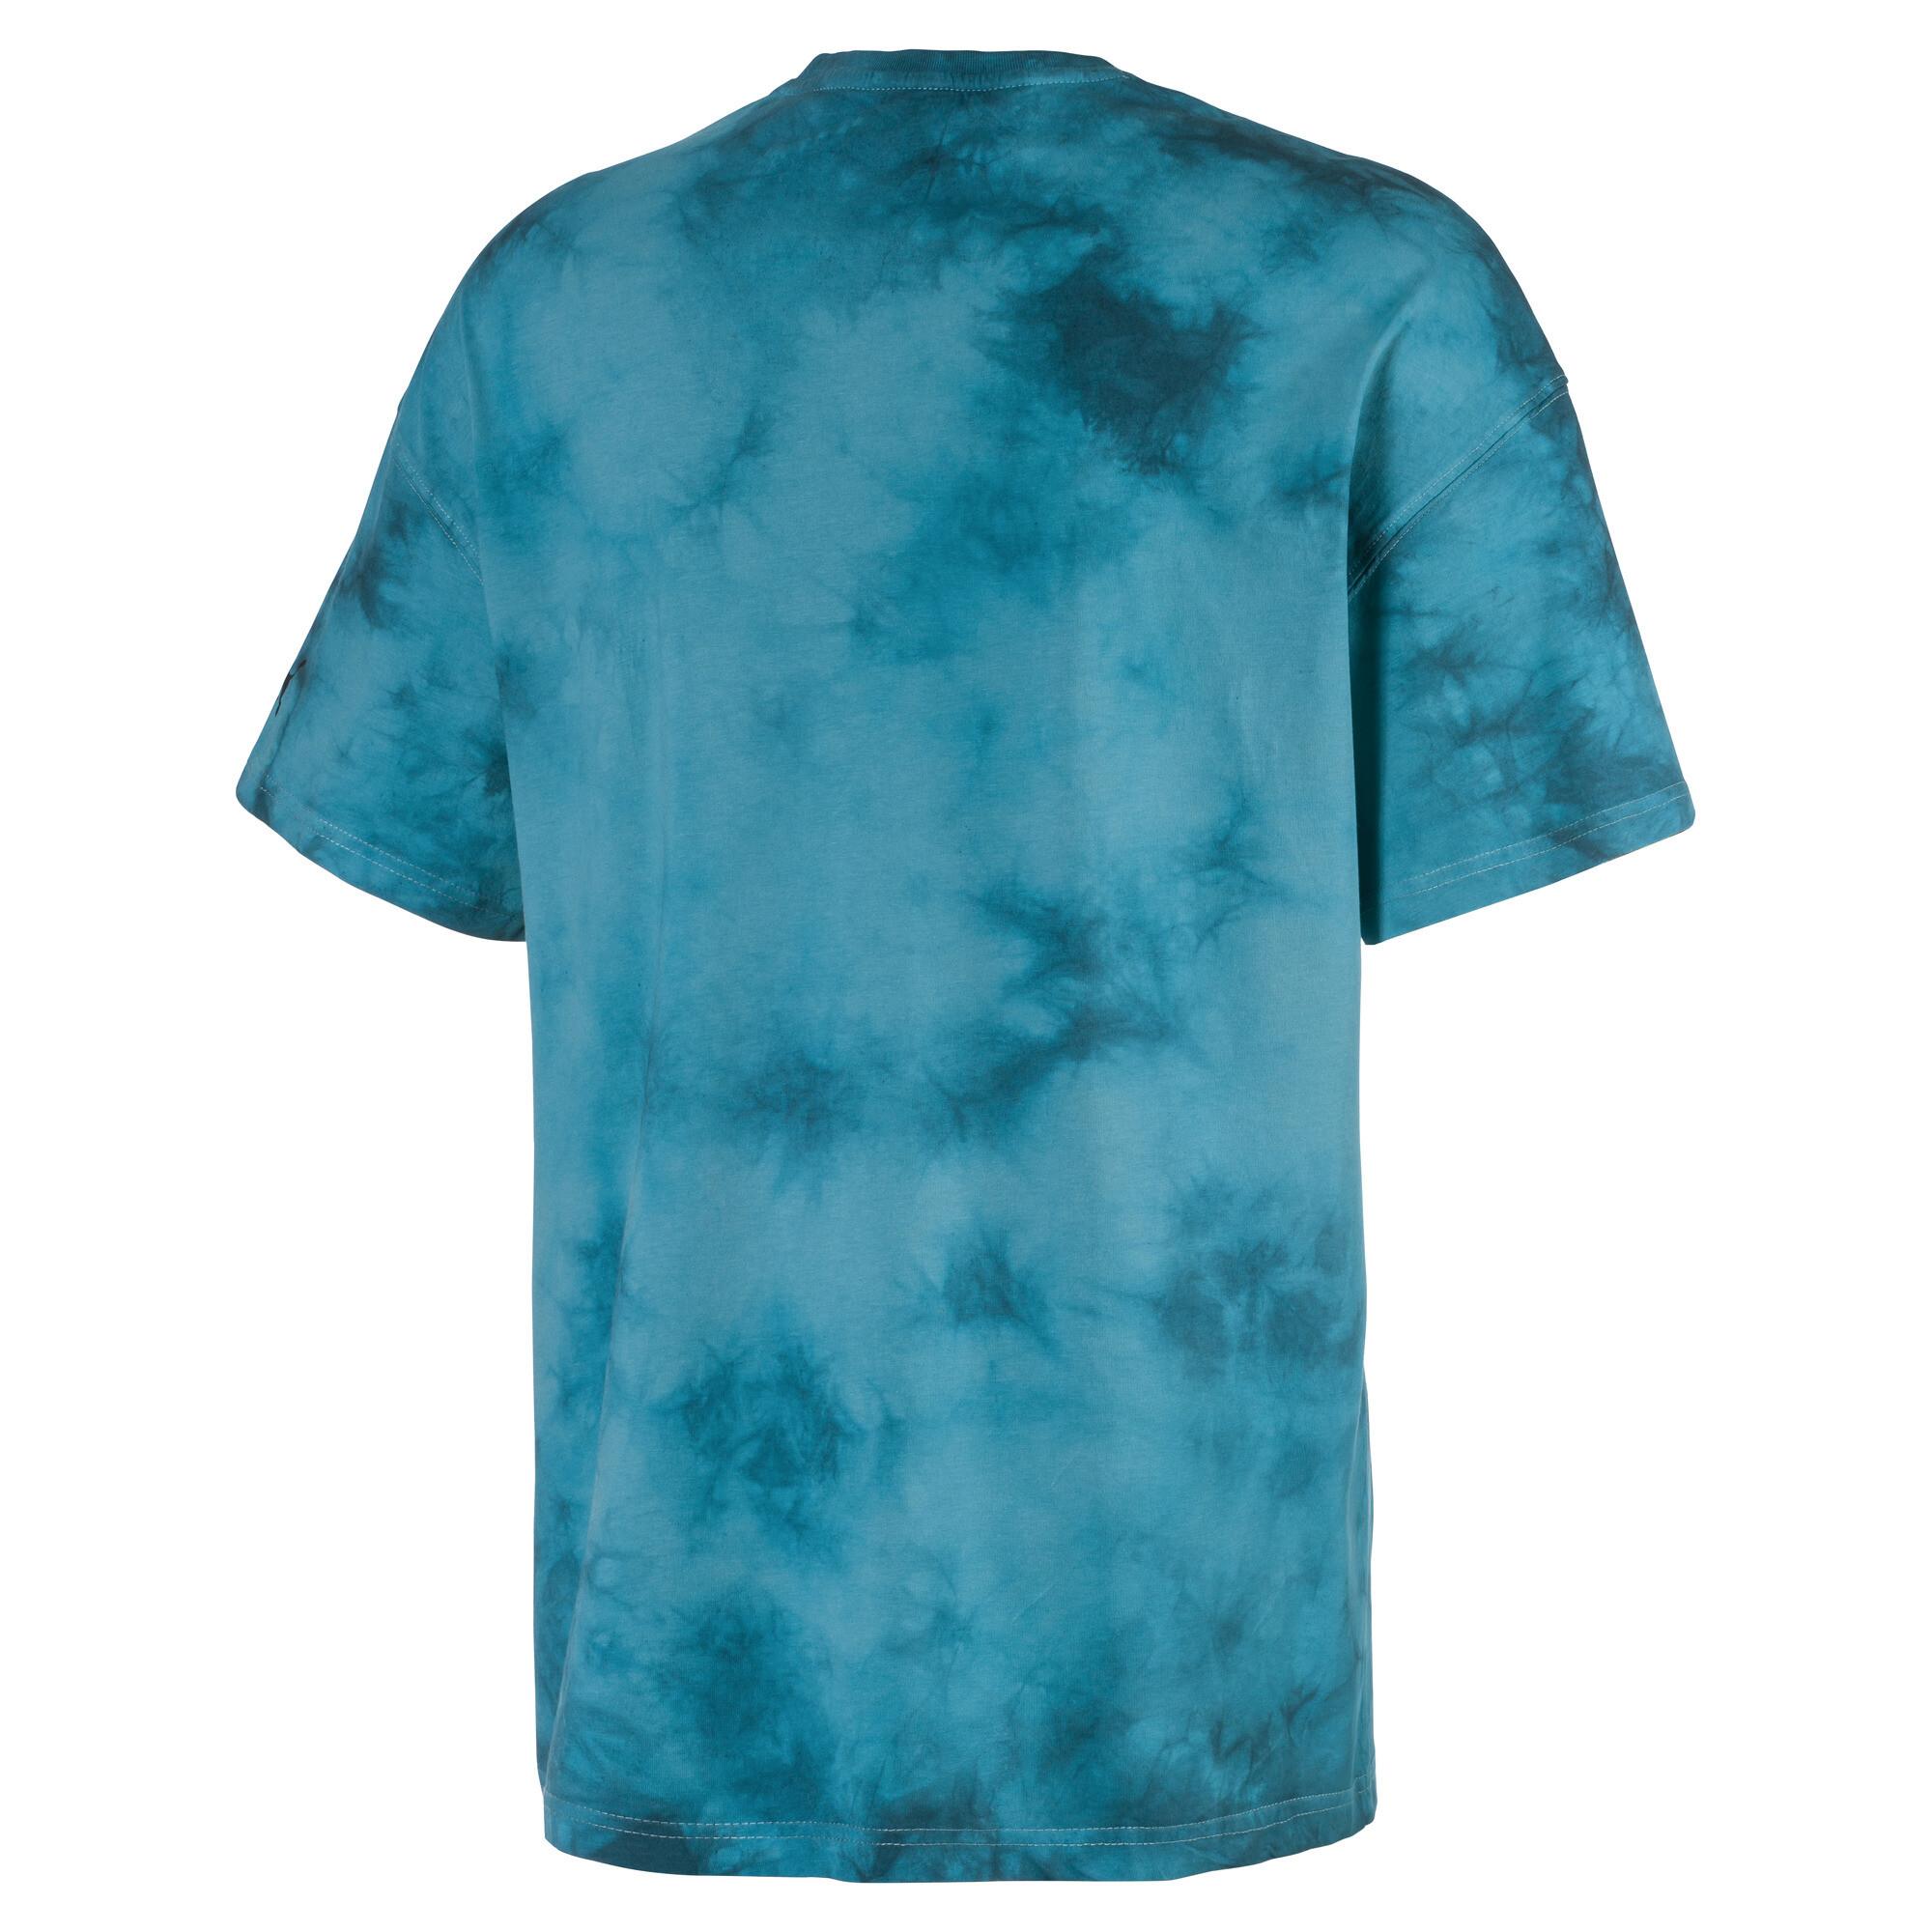 PUMA-Boxy-Herren-T-Shirt-Maenner-T-Shirt-Neu Indexbild 3